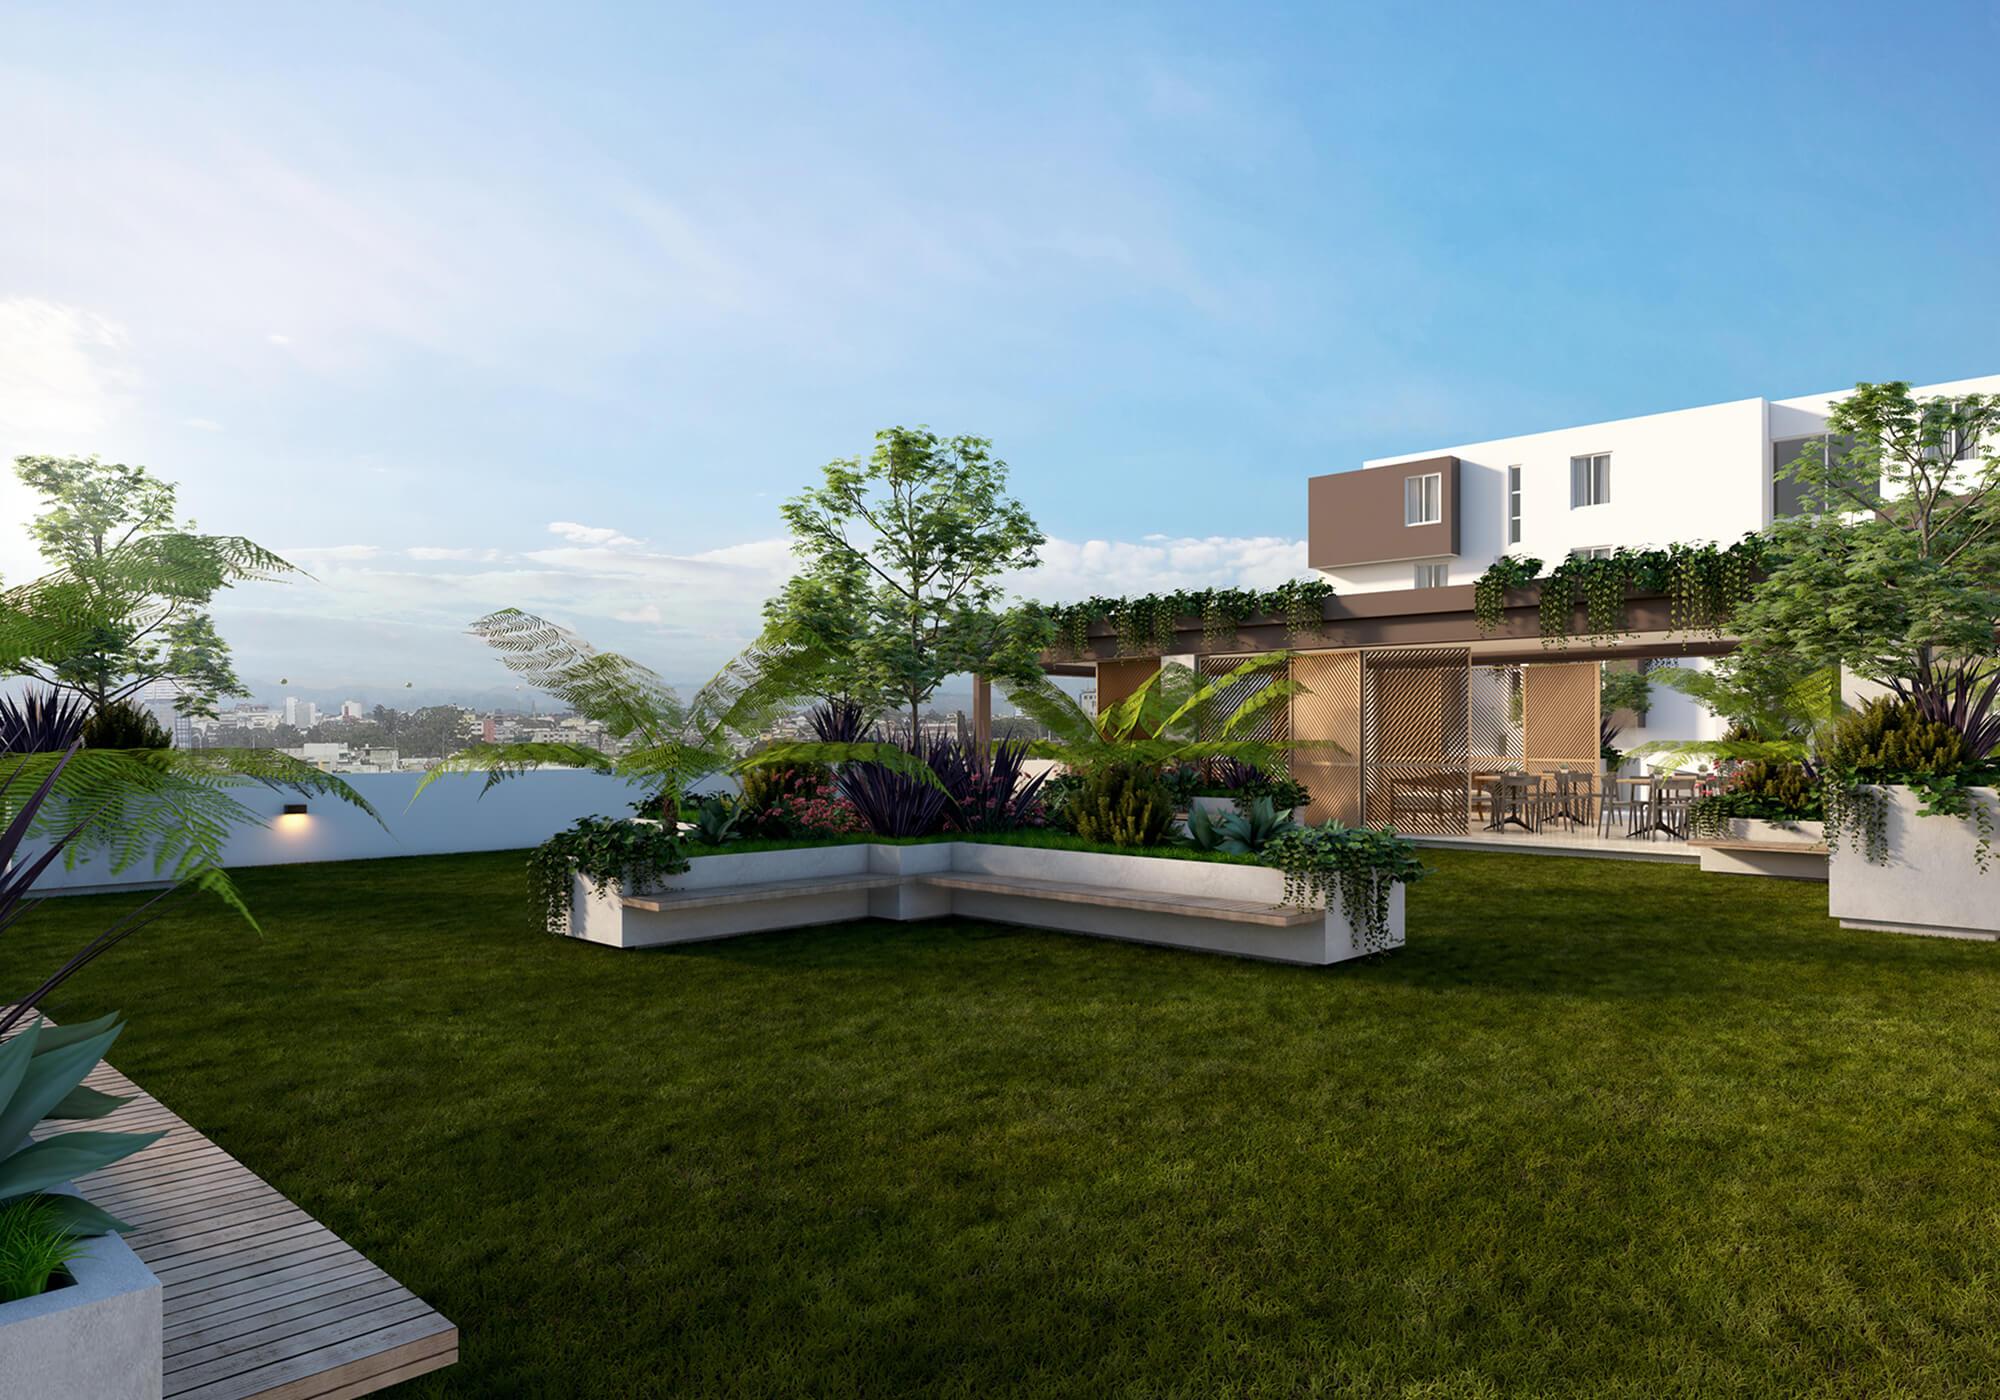 vidali green rooftop